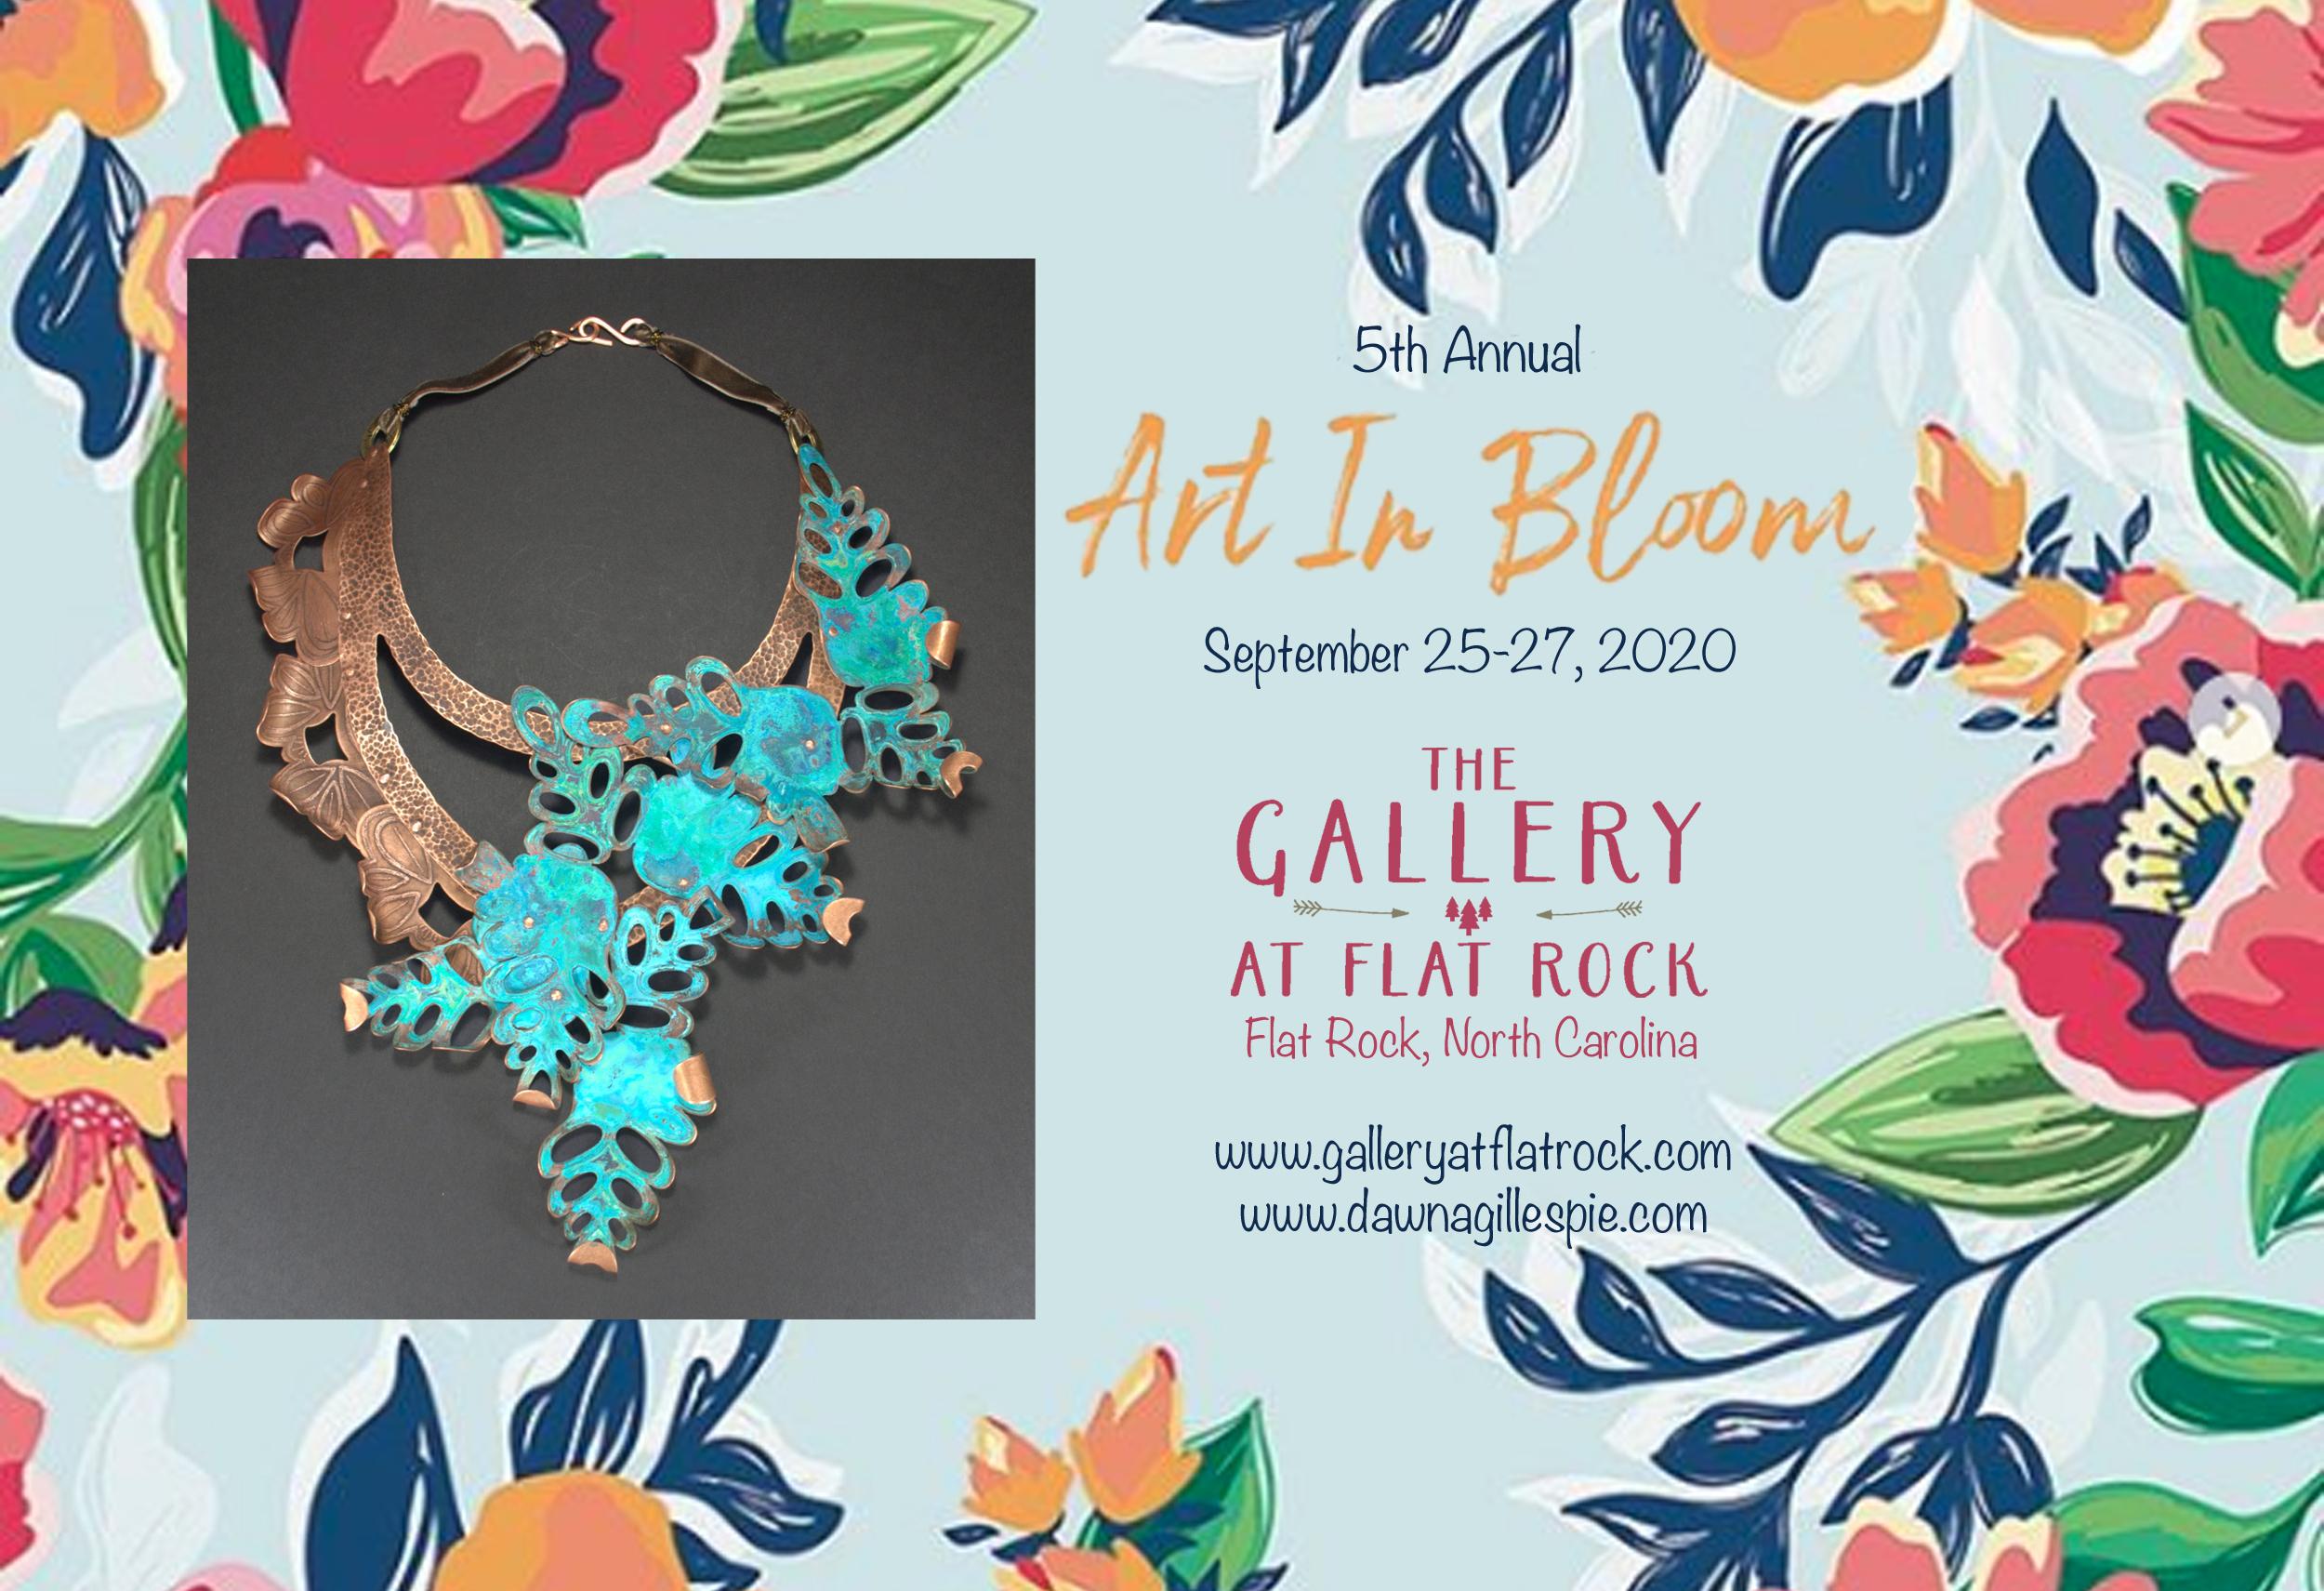 dawna_gillespie_art_in_bloom_2020_gallery_at_flat_rock